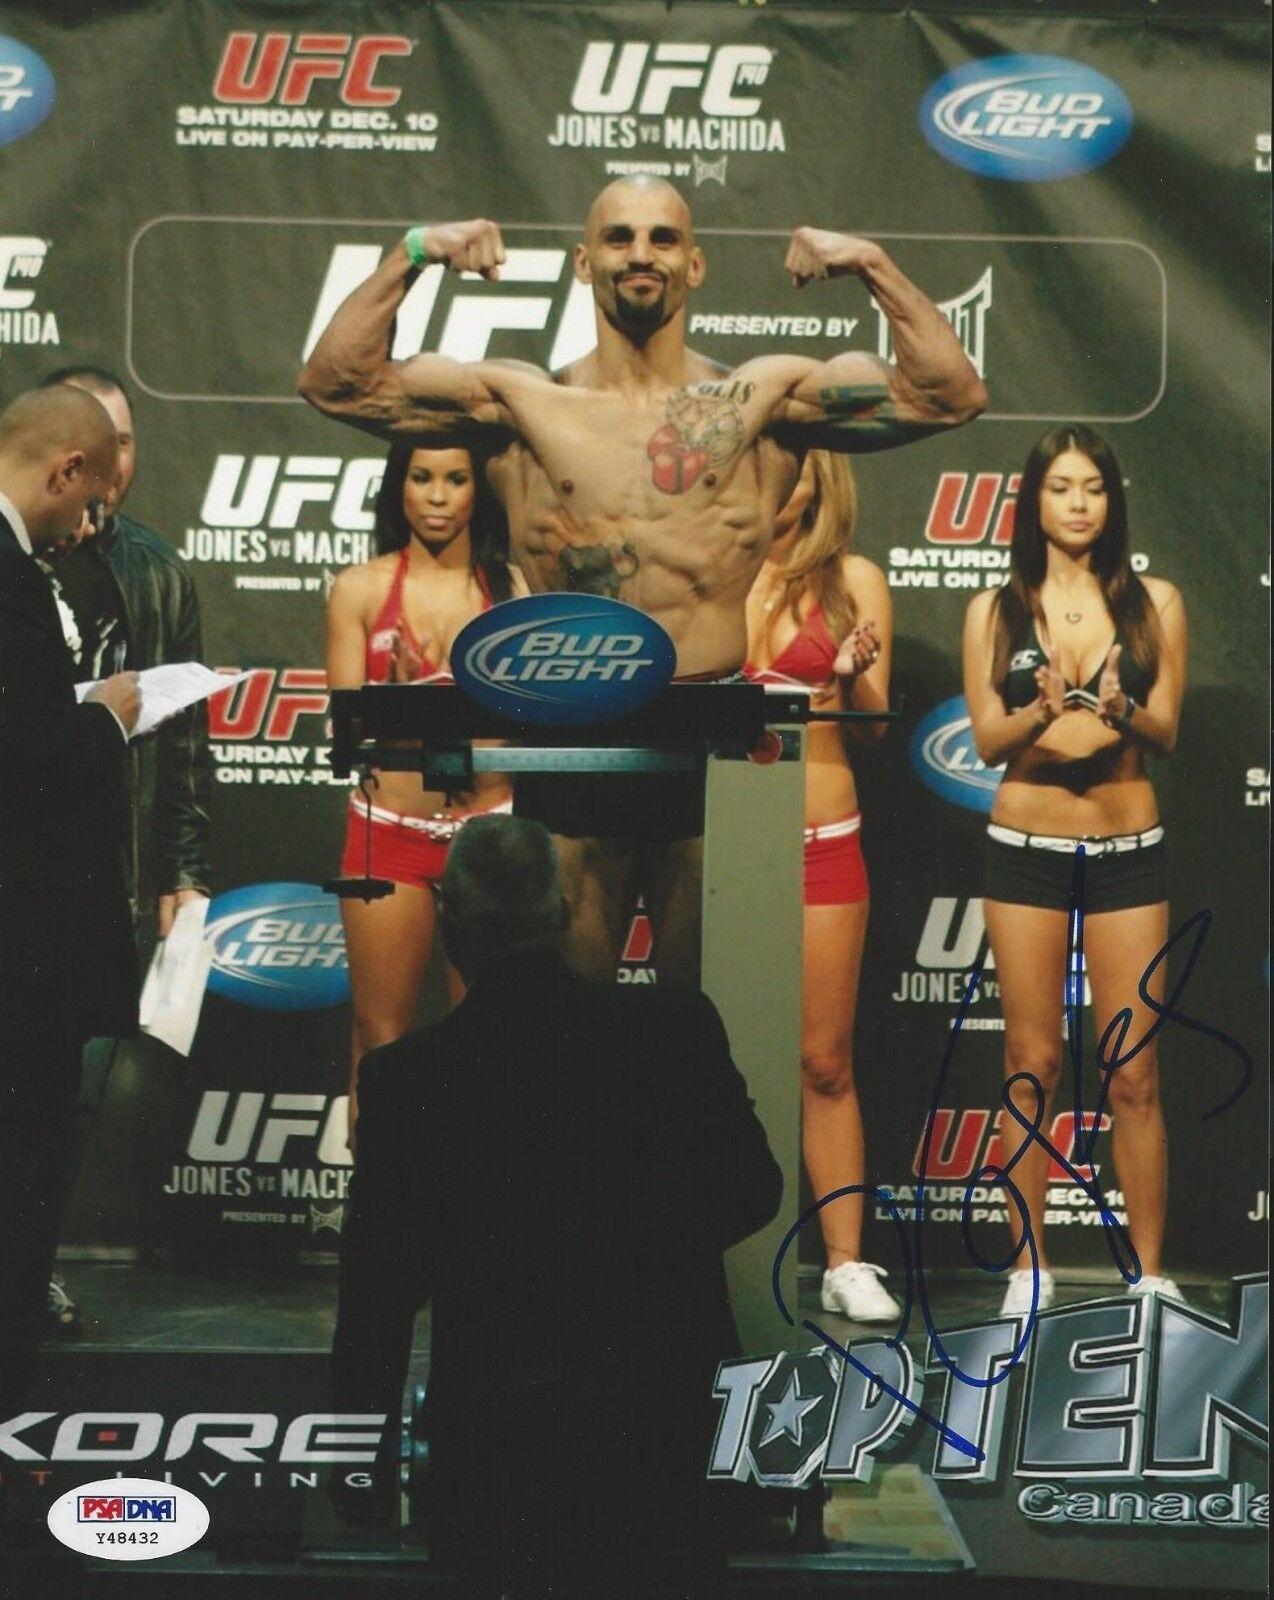 Costas Philippou UFC Fighter signed 8x10 photo PSA/DNA # Y48432